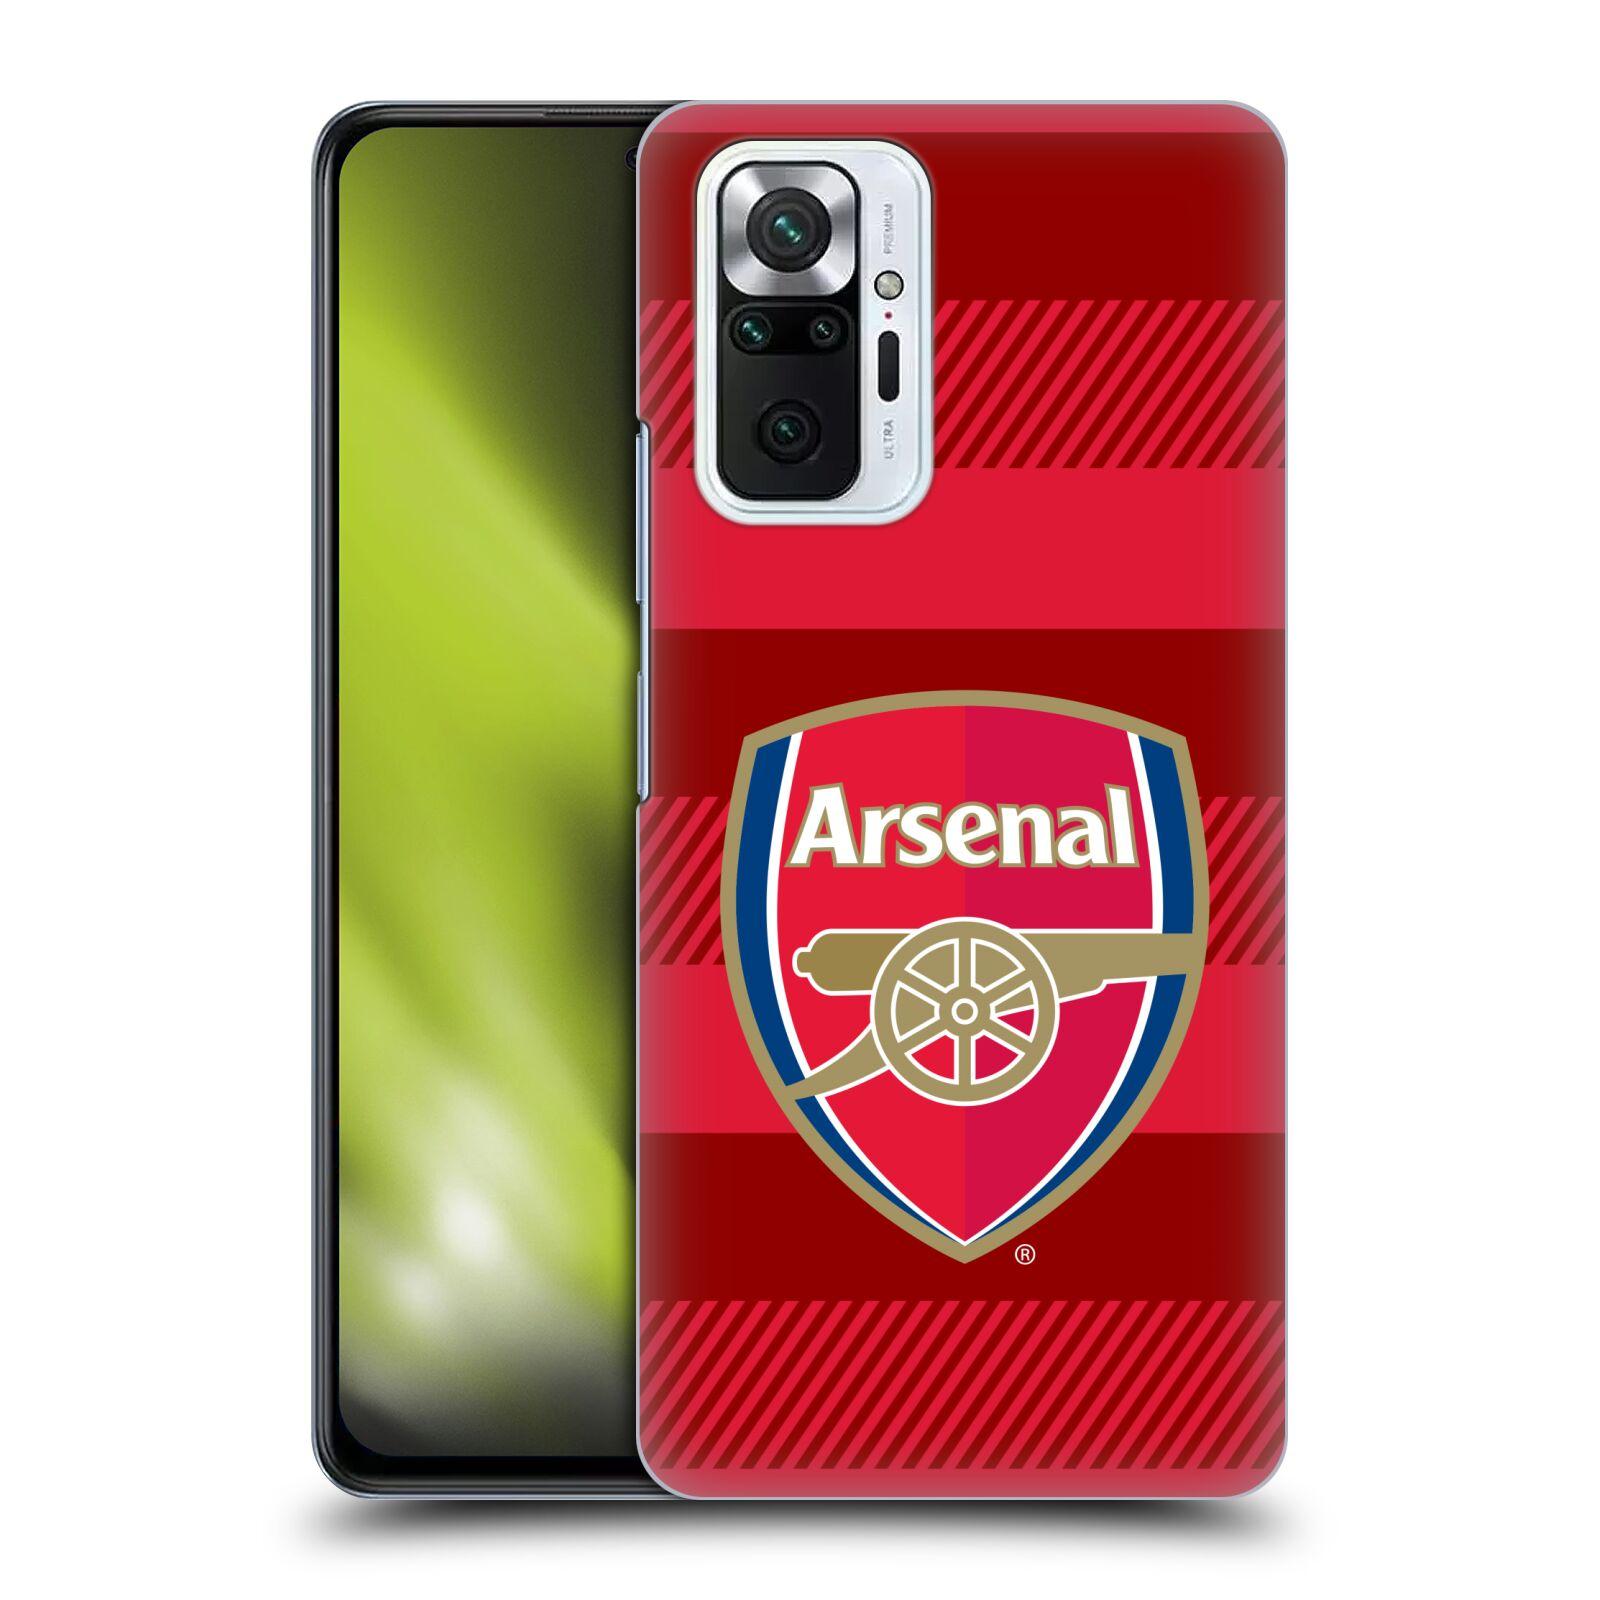 Plastové pouzdro na mobil Xiaomi Redmi Note 10 Pro - Head Case - Arsenal FC - Logo s pruhy